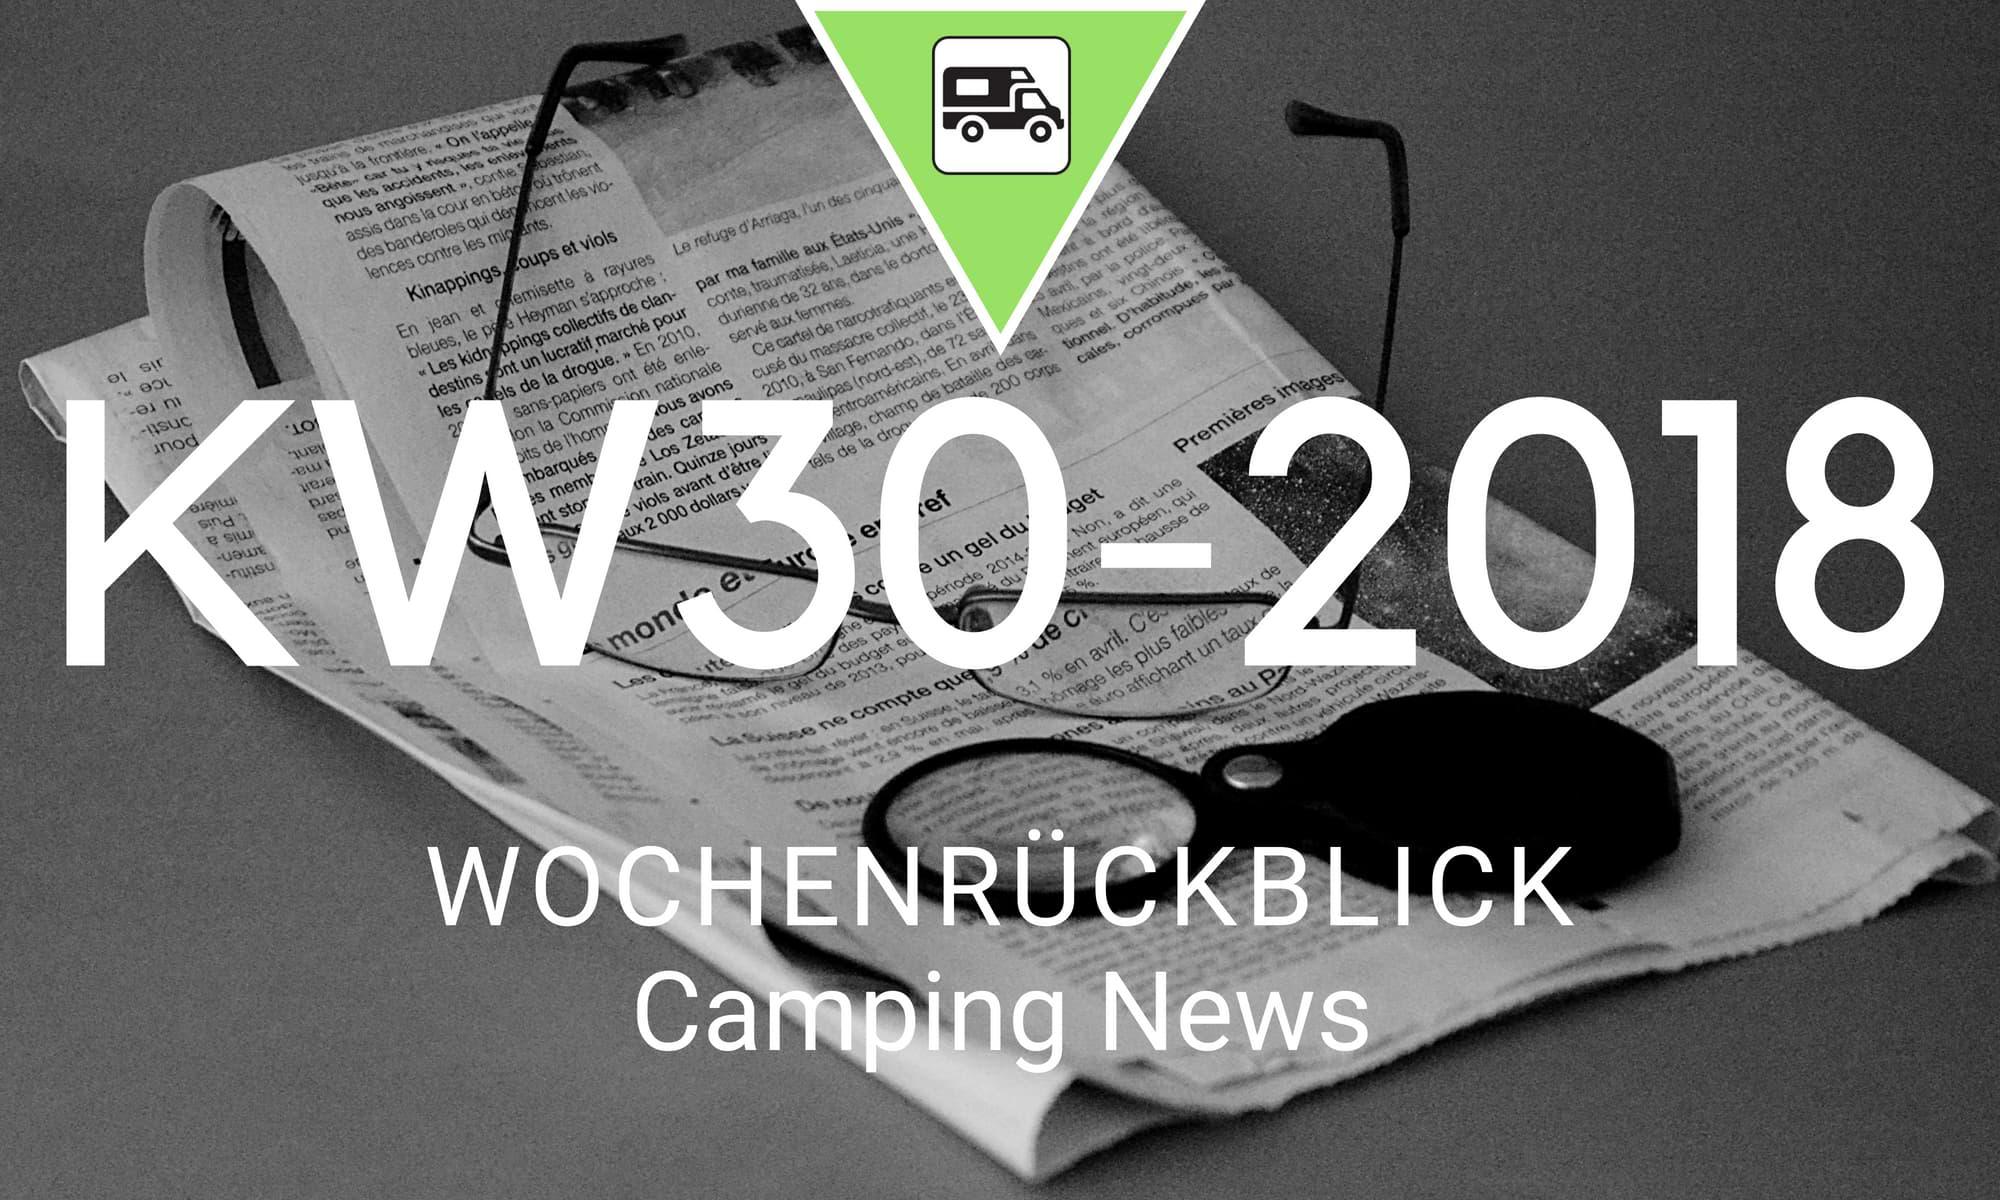 Wochenrückblick Camping News KW30-2018